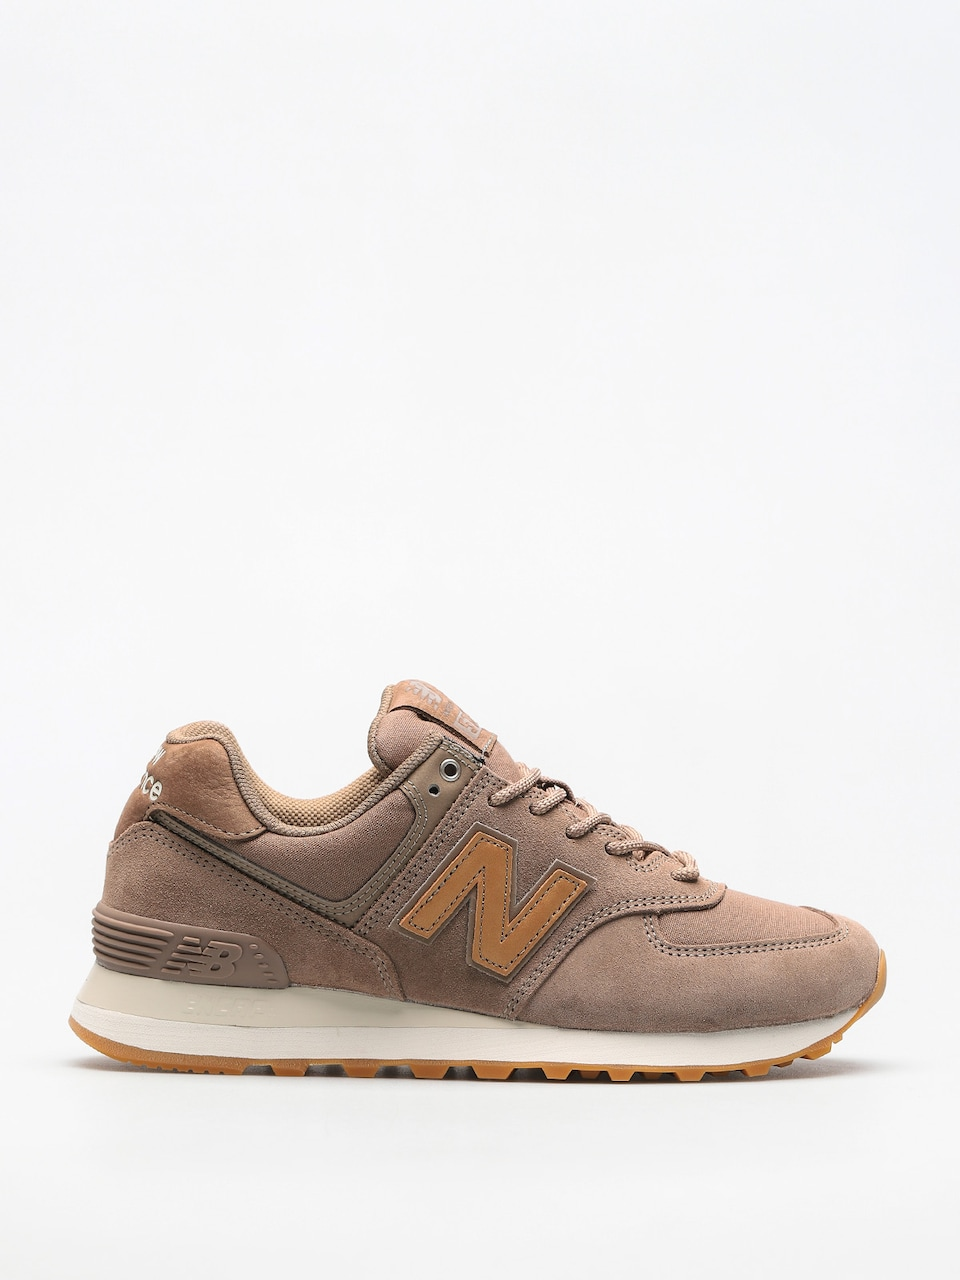 New Balance Shoes 574 Wmn (mushroom)